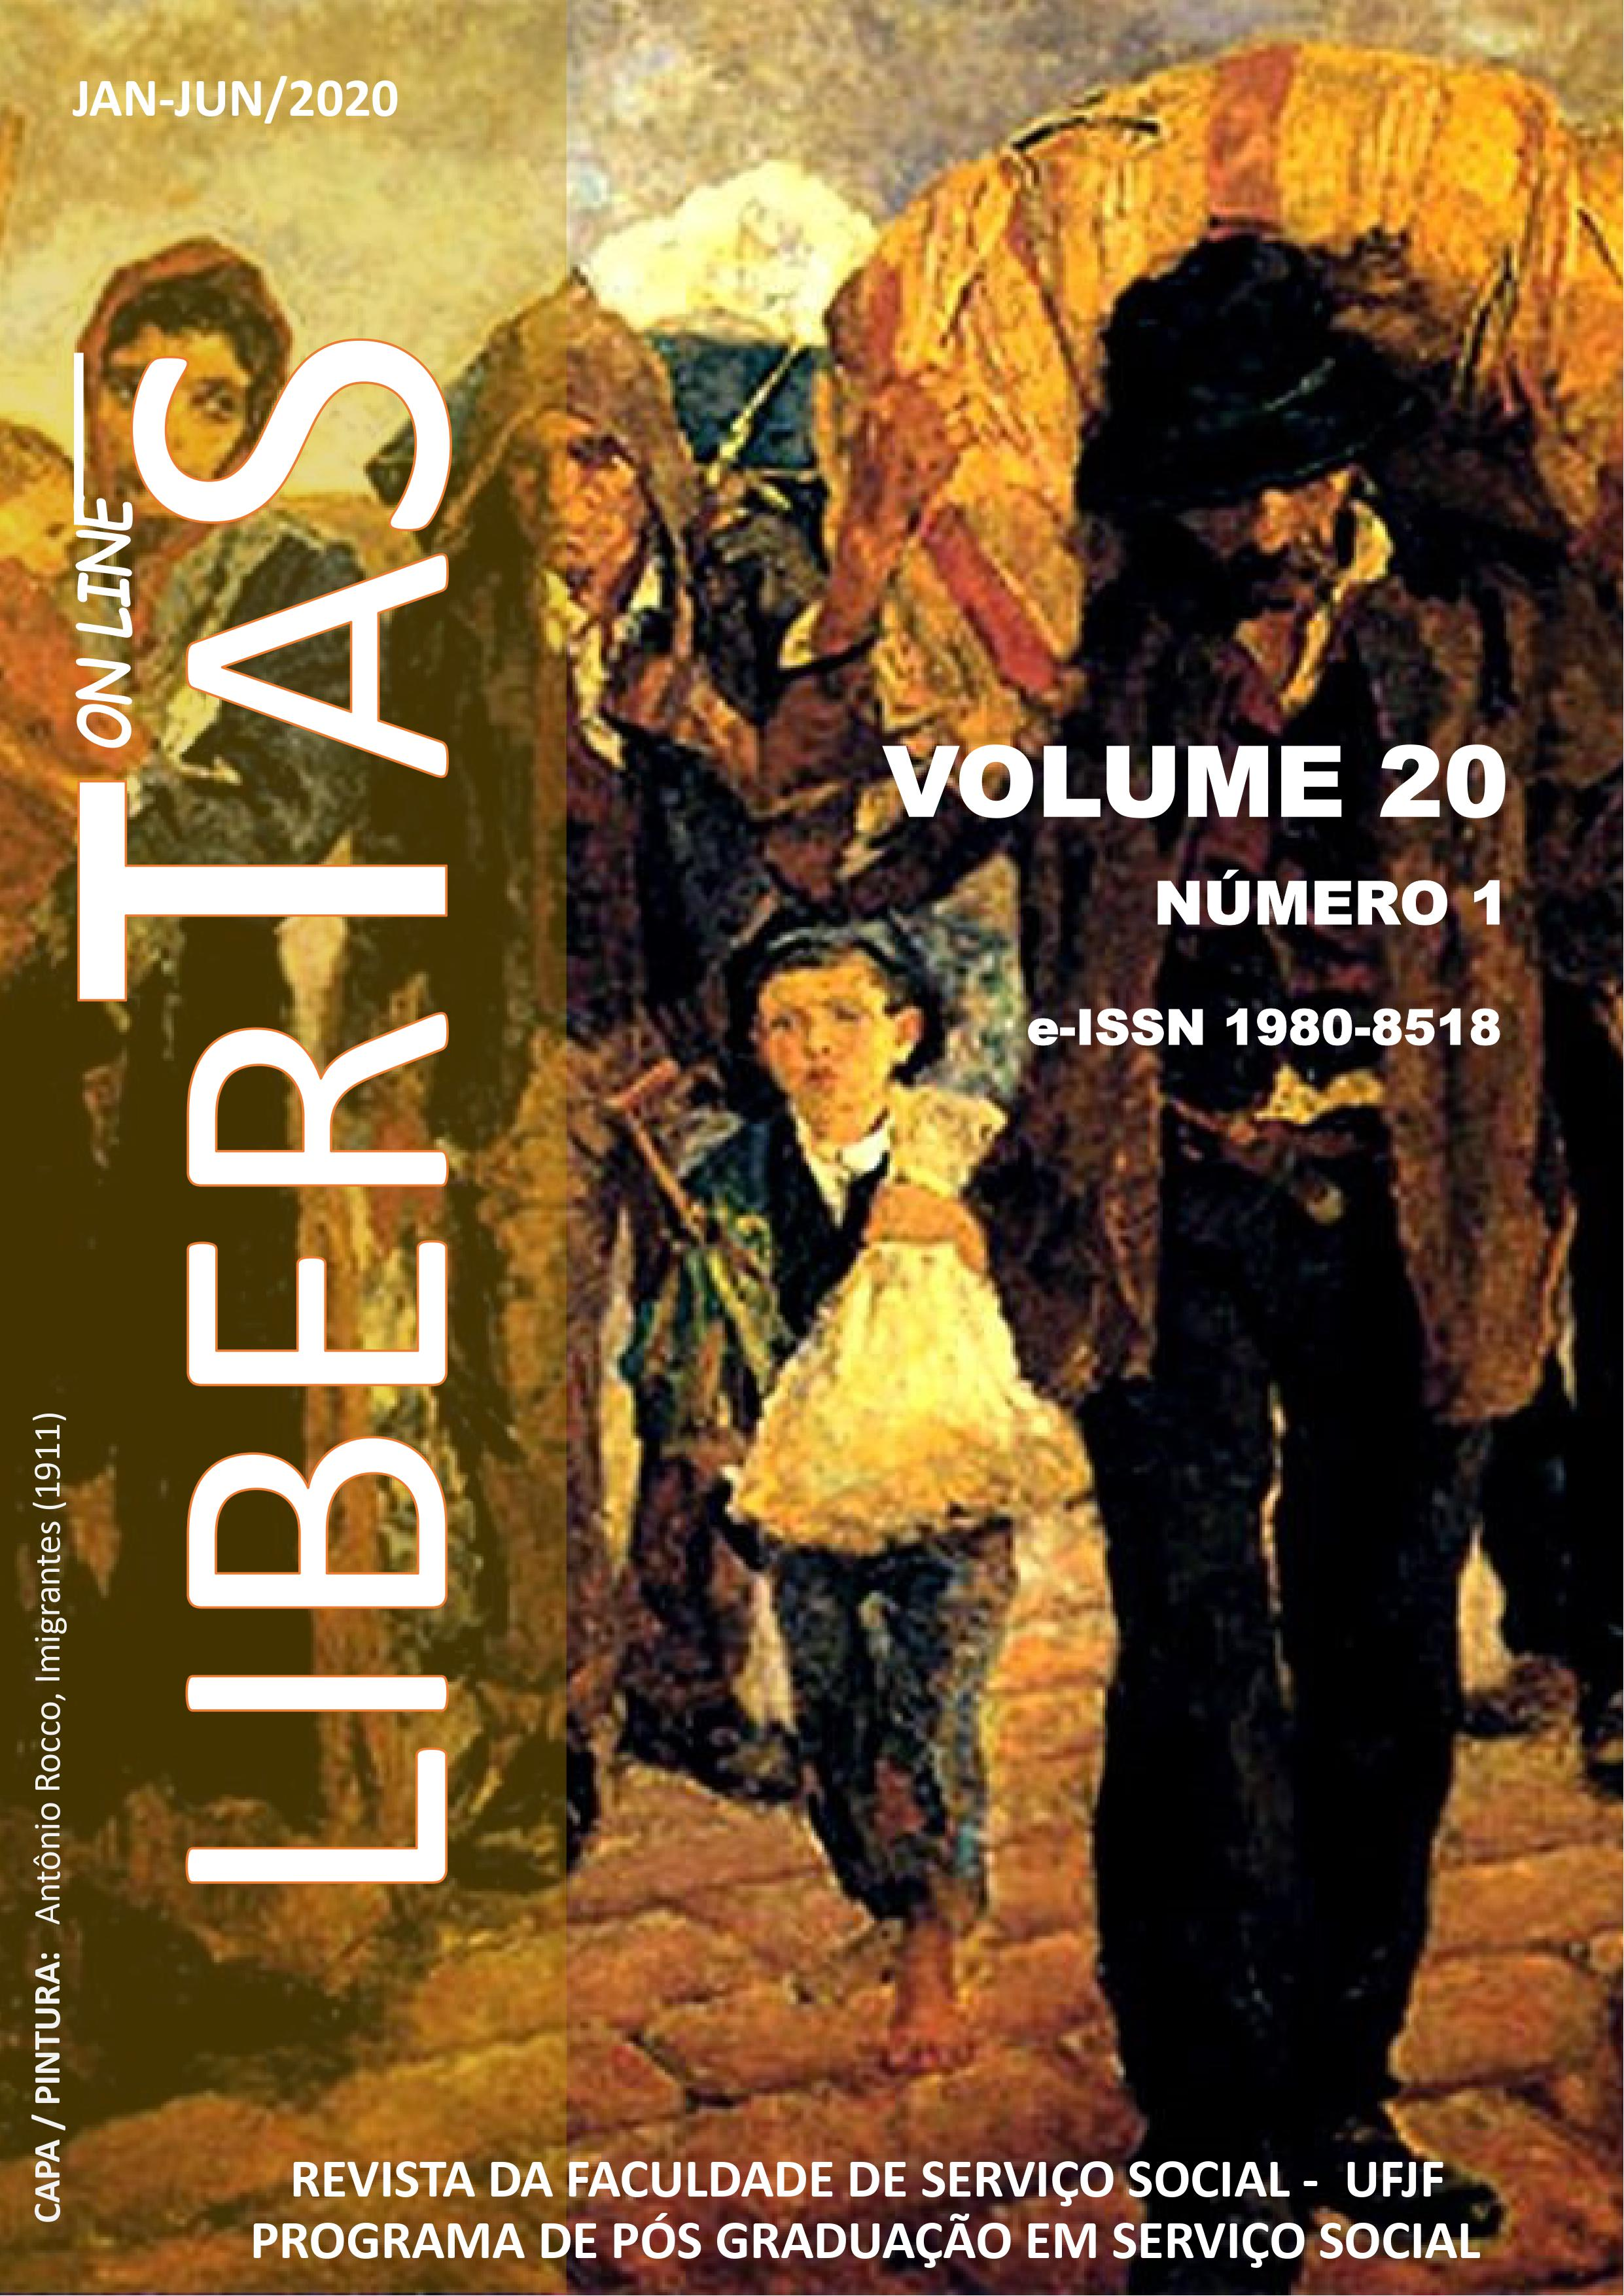 Visualizar v. 20 n. 1 (2020): Revista Libertas - ISSN: 1980-8518 (jan / jun 2020)